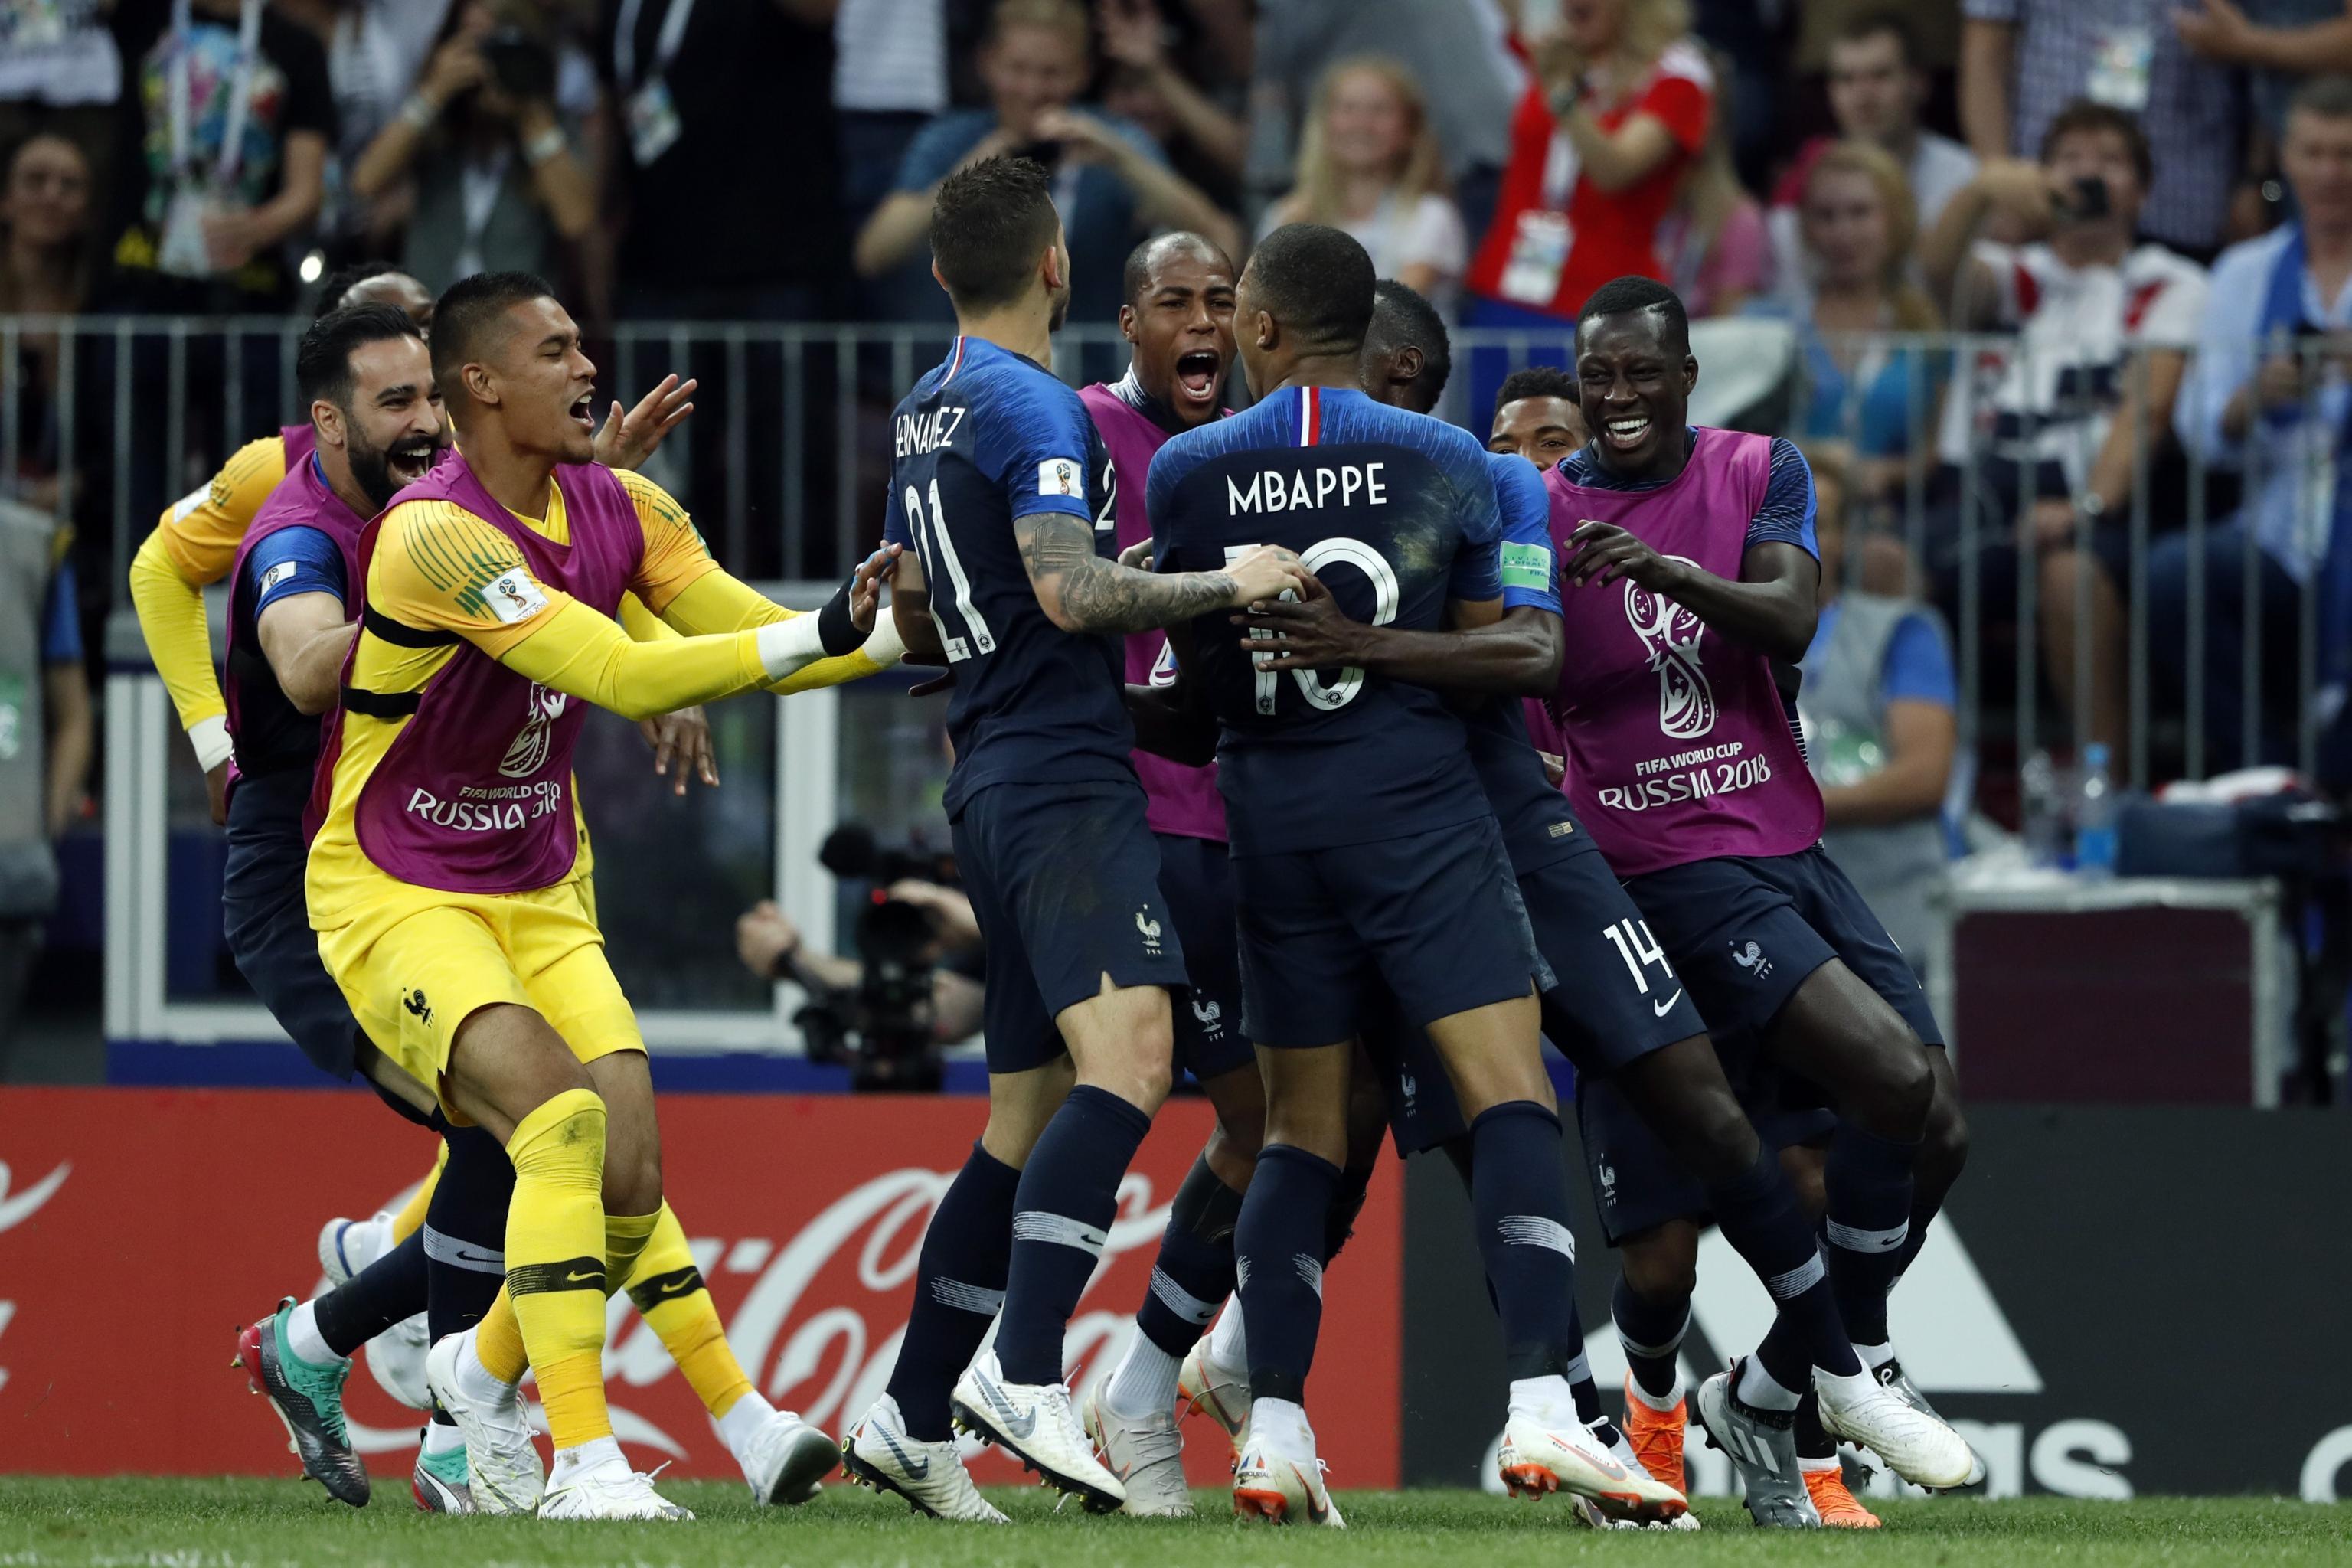 huge selection of 56d16 68dc1 France, Antoine Griezmann, Beat Croatia, Luka Modric 4-2 in ...